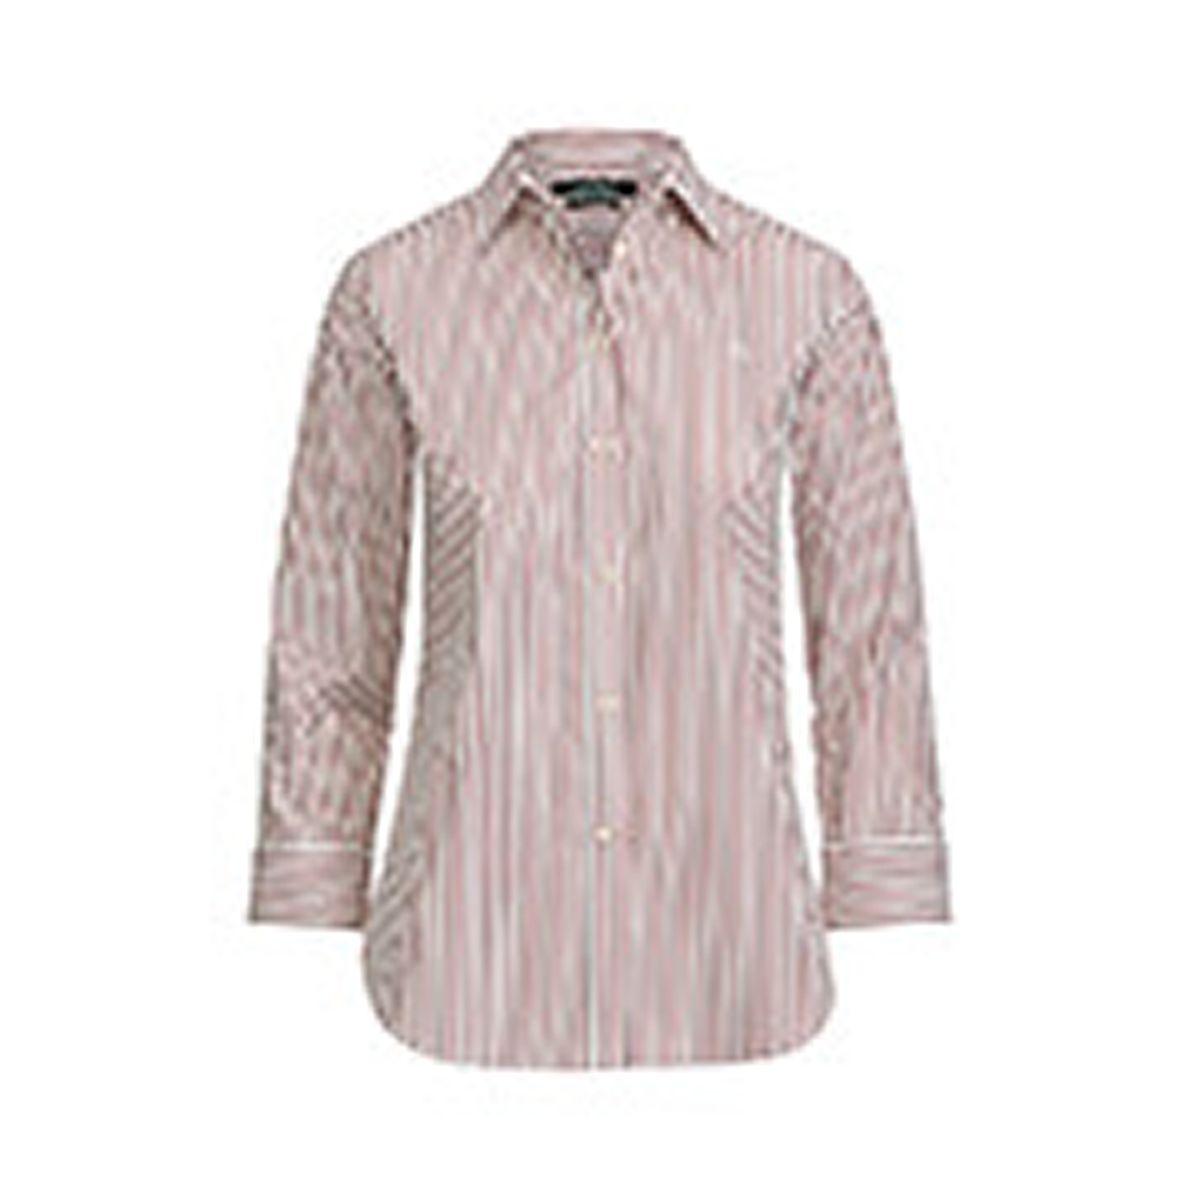 236a528b702 Ralph Lauren Petite Clothing - Dresses   More - Macy s